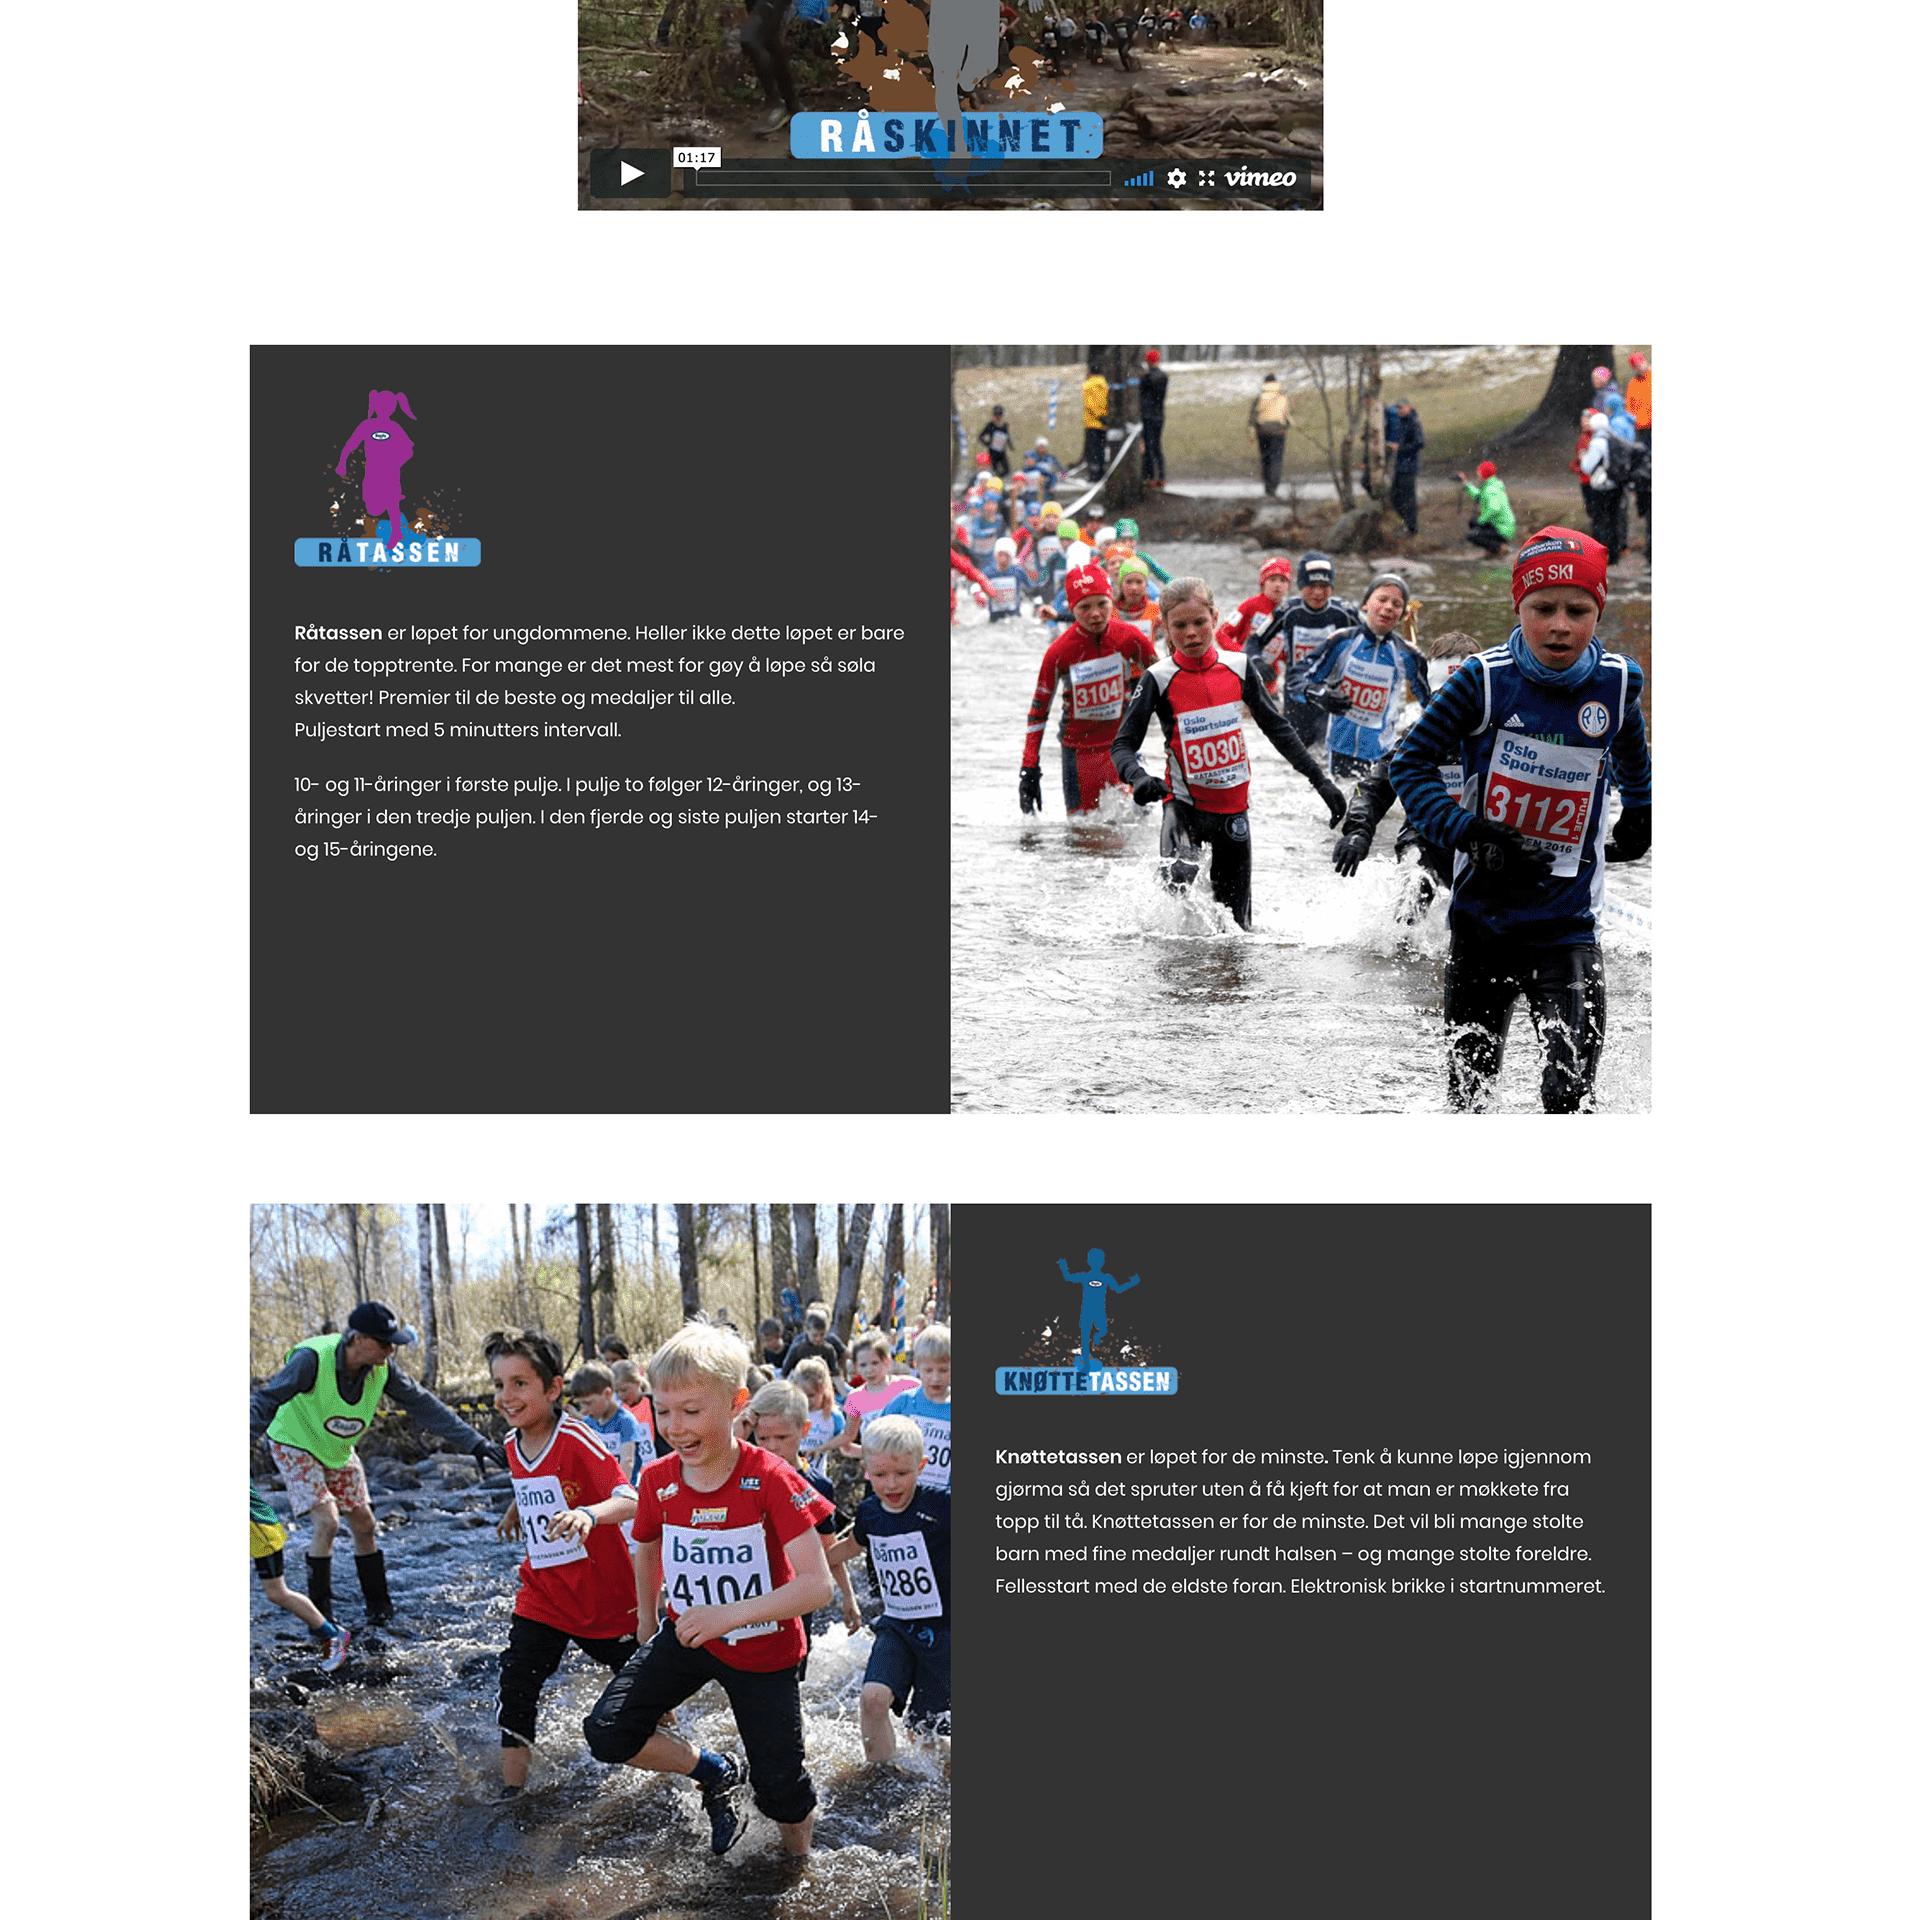 Råskinnet webside